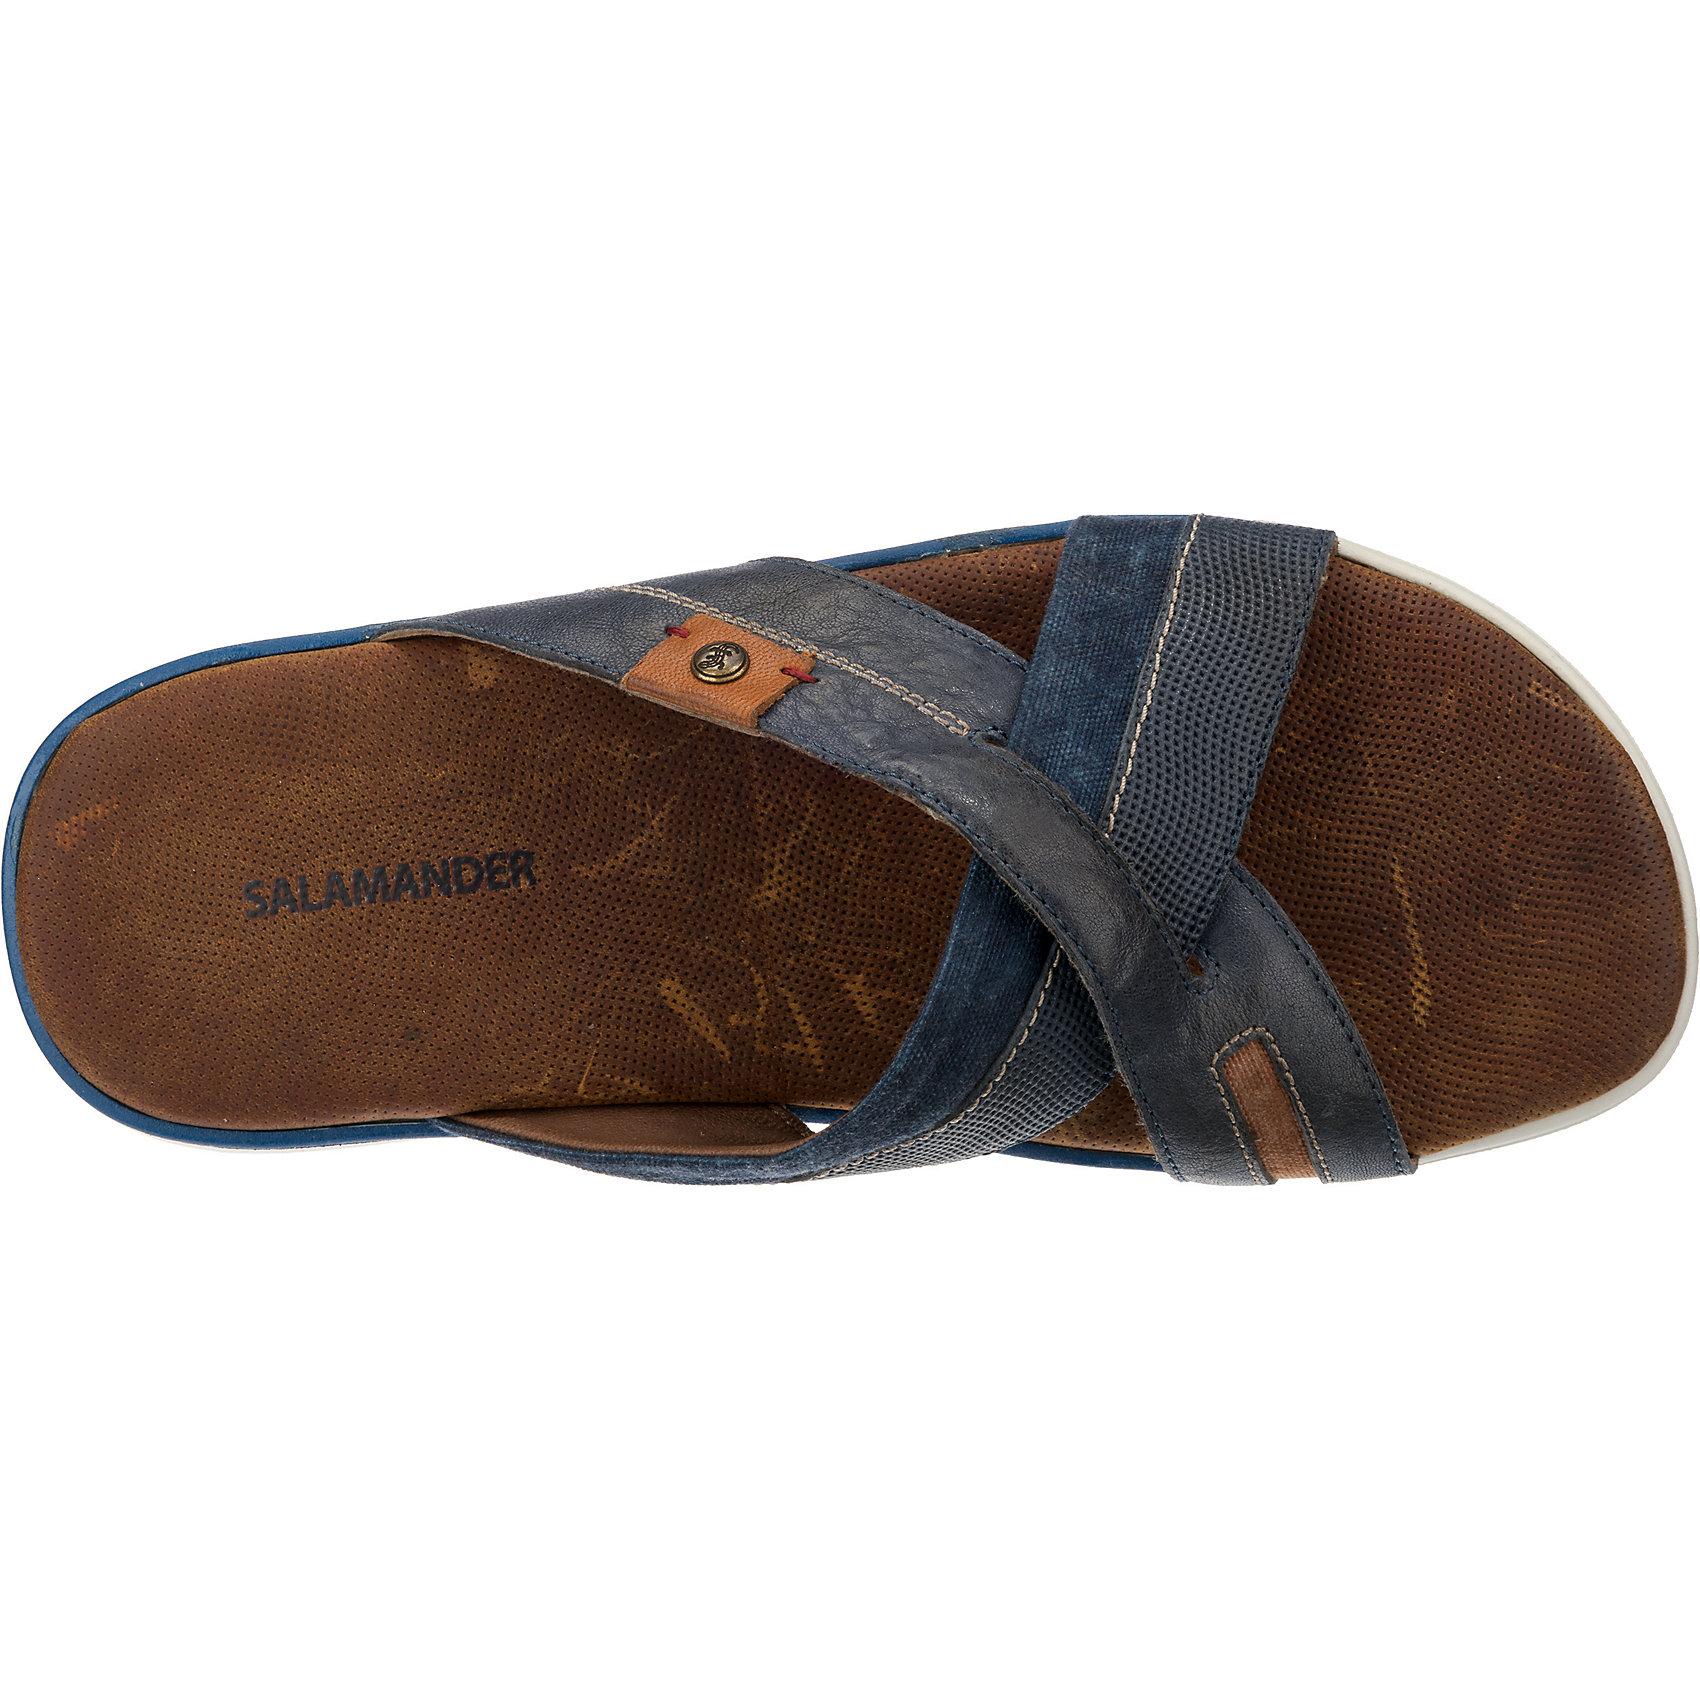 Neu SALAMANDER Herren JENS Komfort-Pantoletten 7202085 für Herren SALAMANDER dunkelblau b03ab2